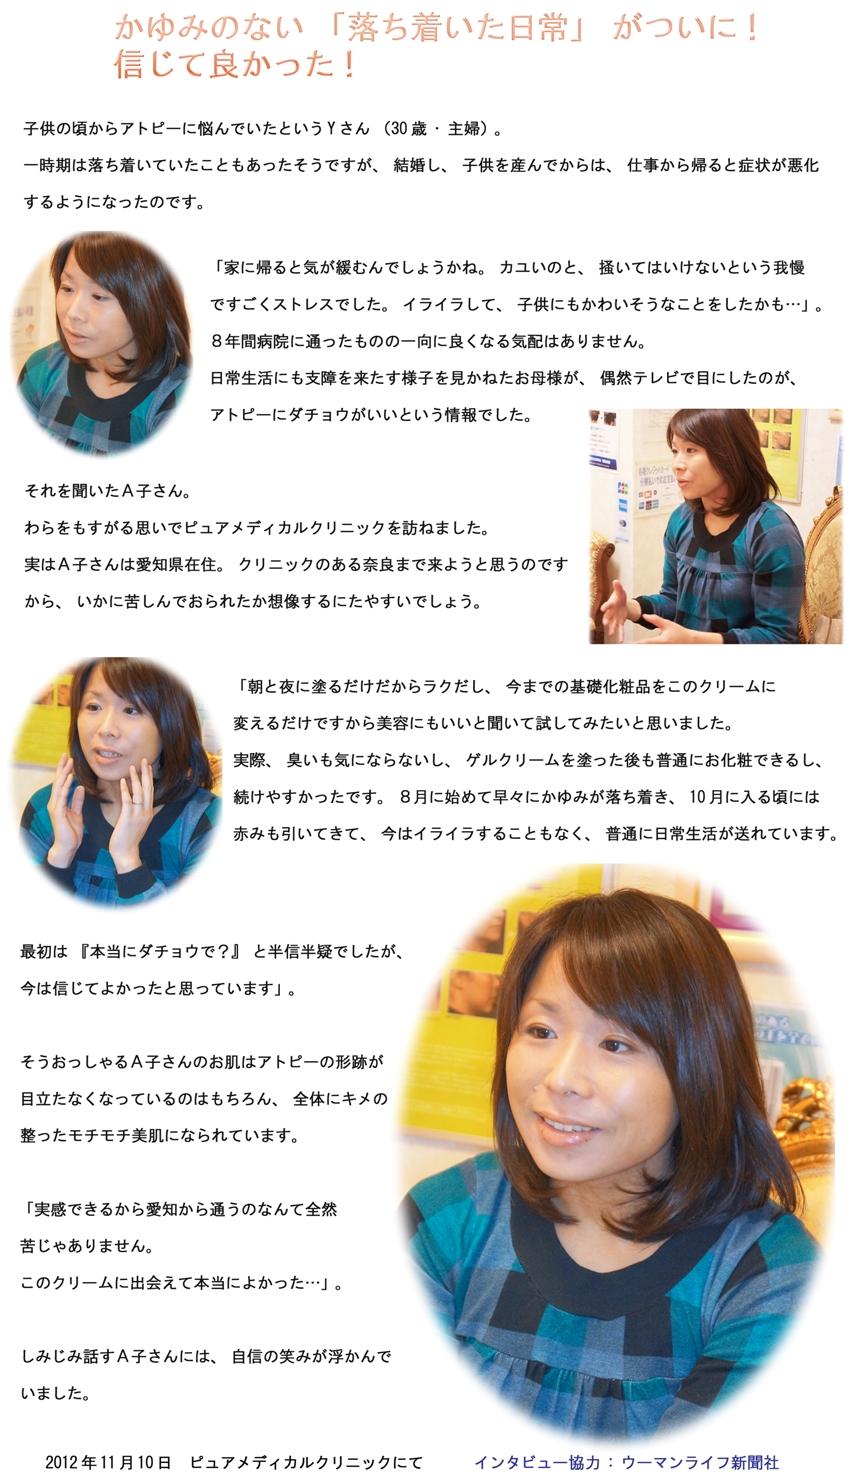 interview7s.jpg